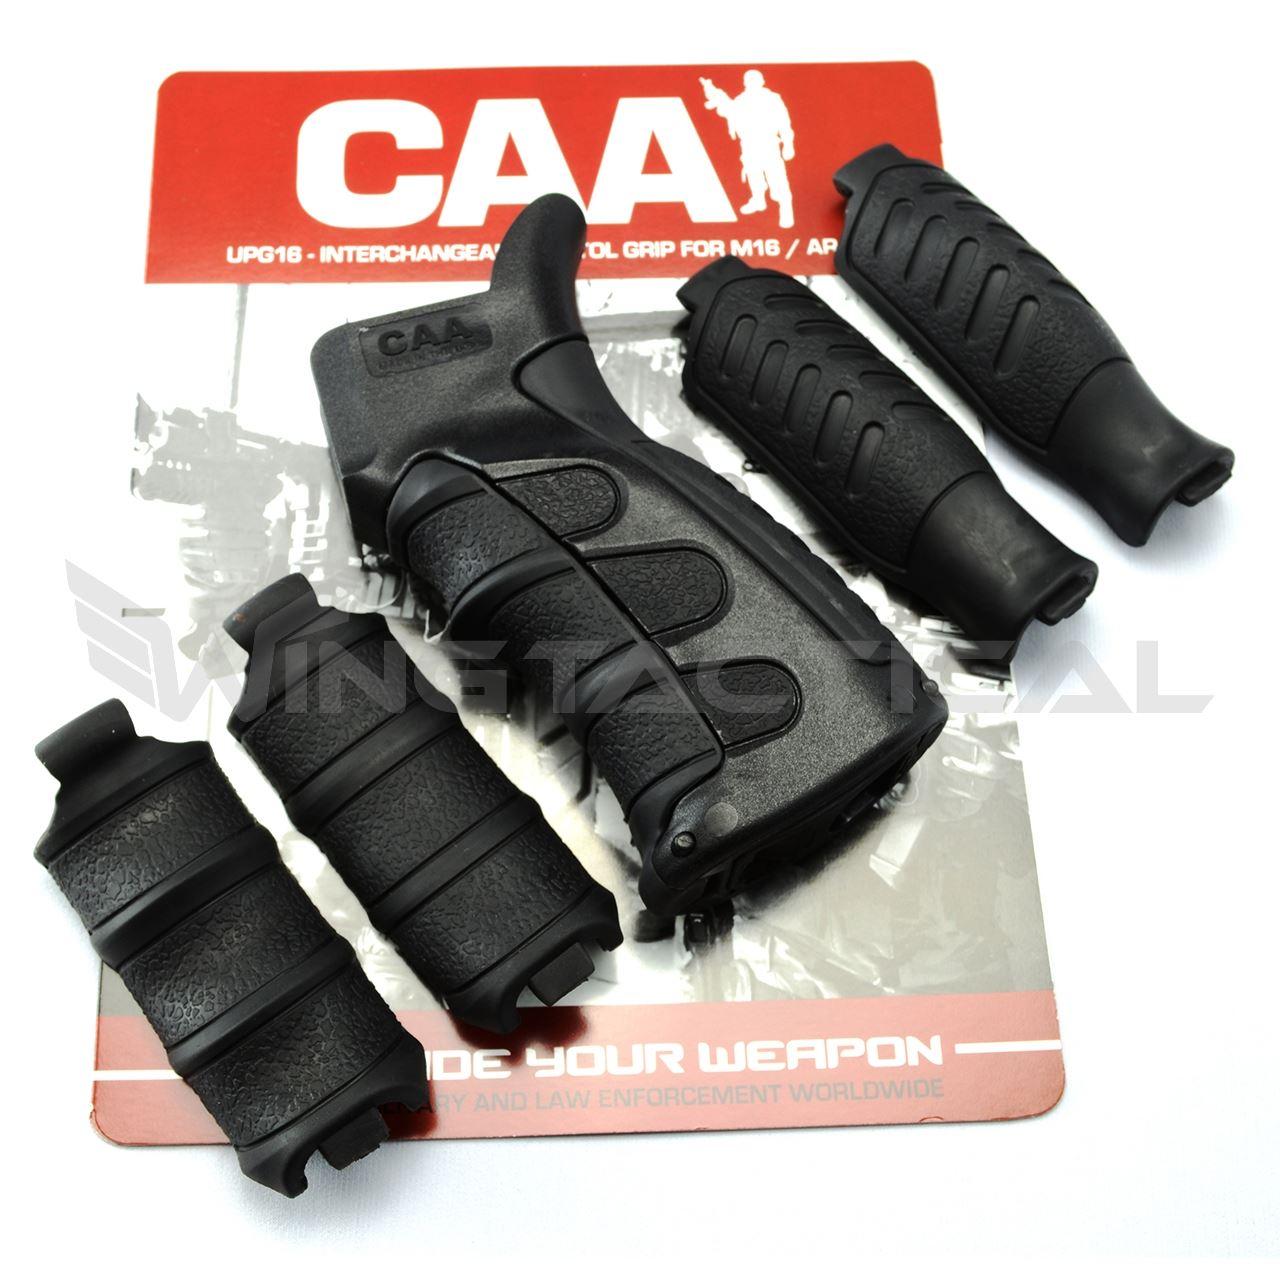 CAA 6 Piece Interchangeable AR-15 Pistol Grip